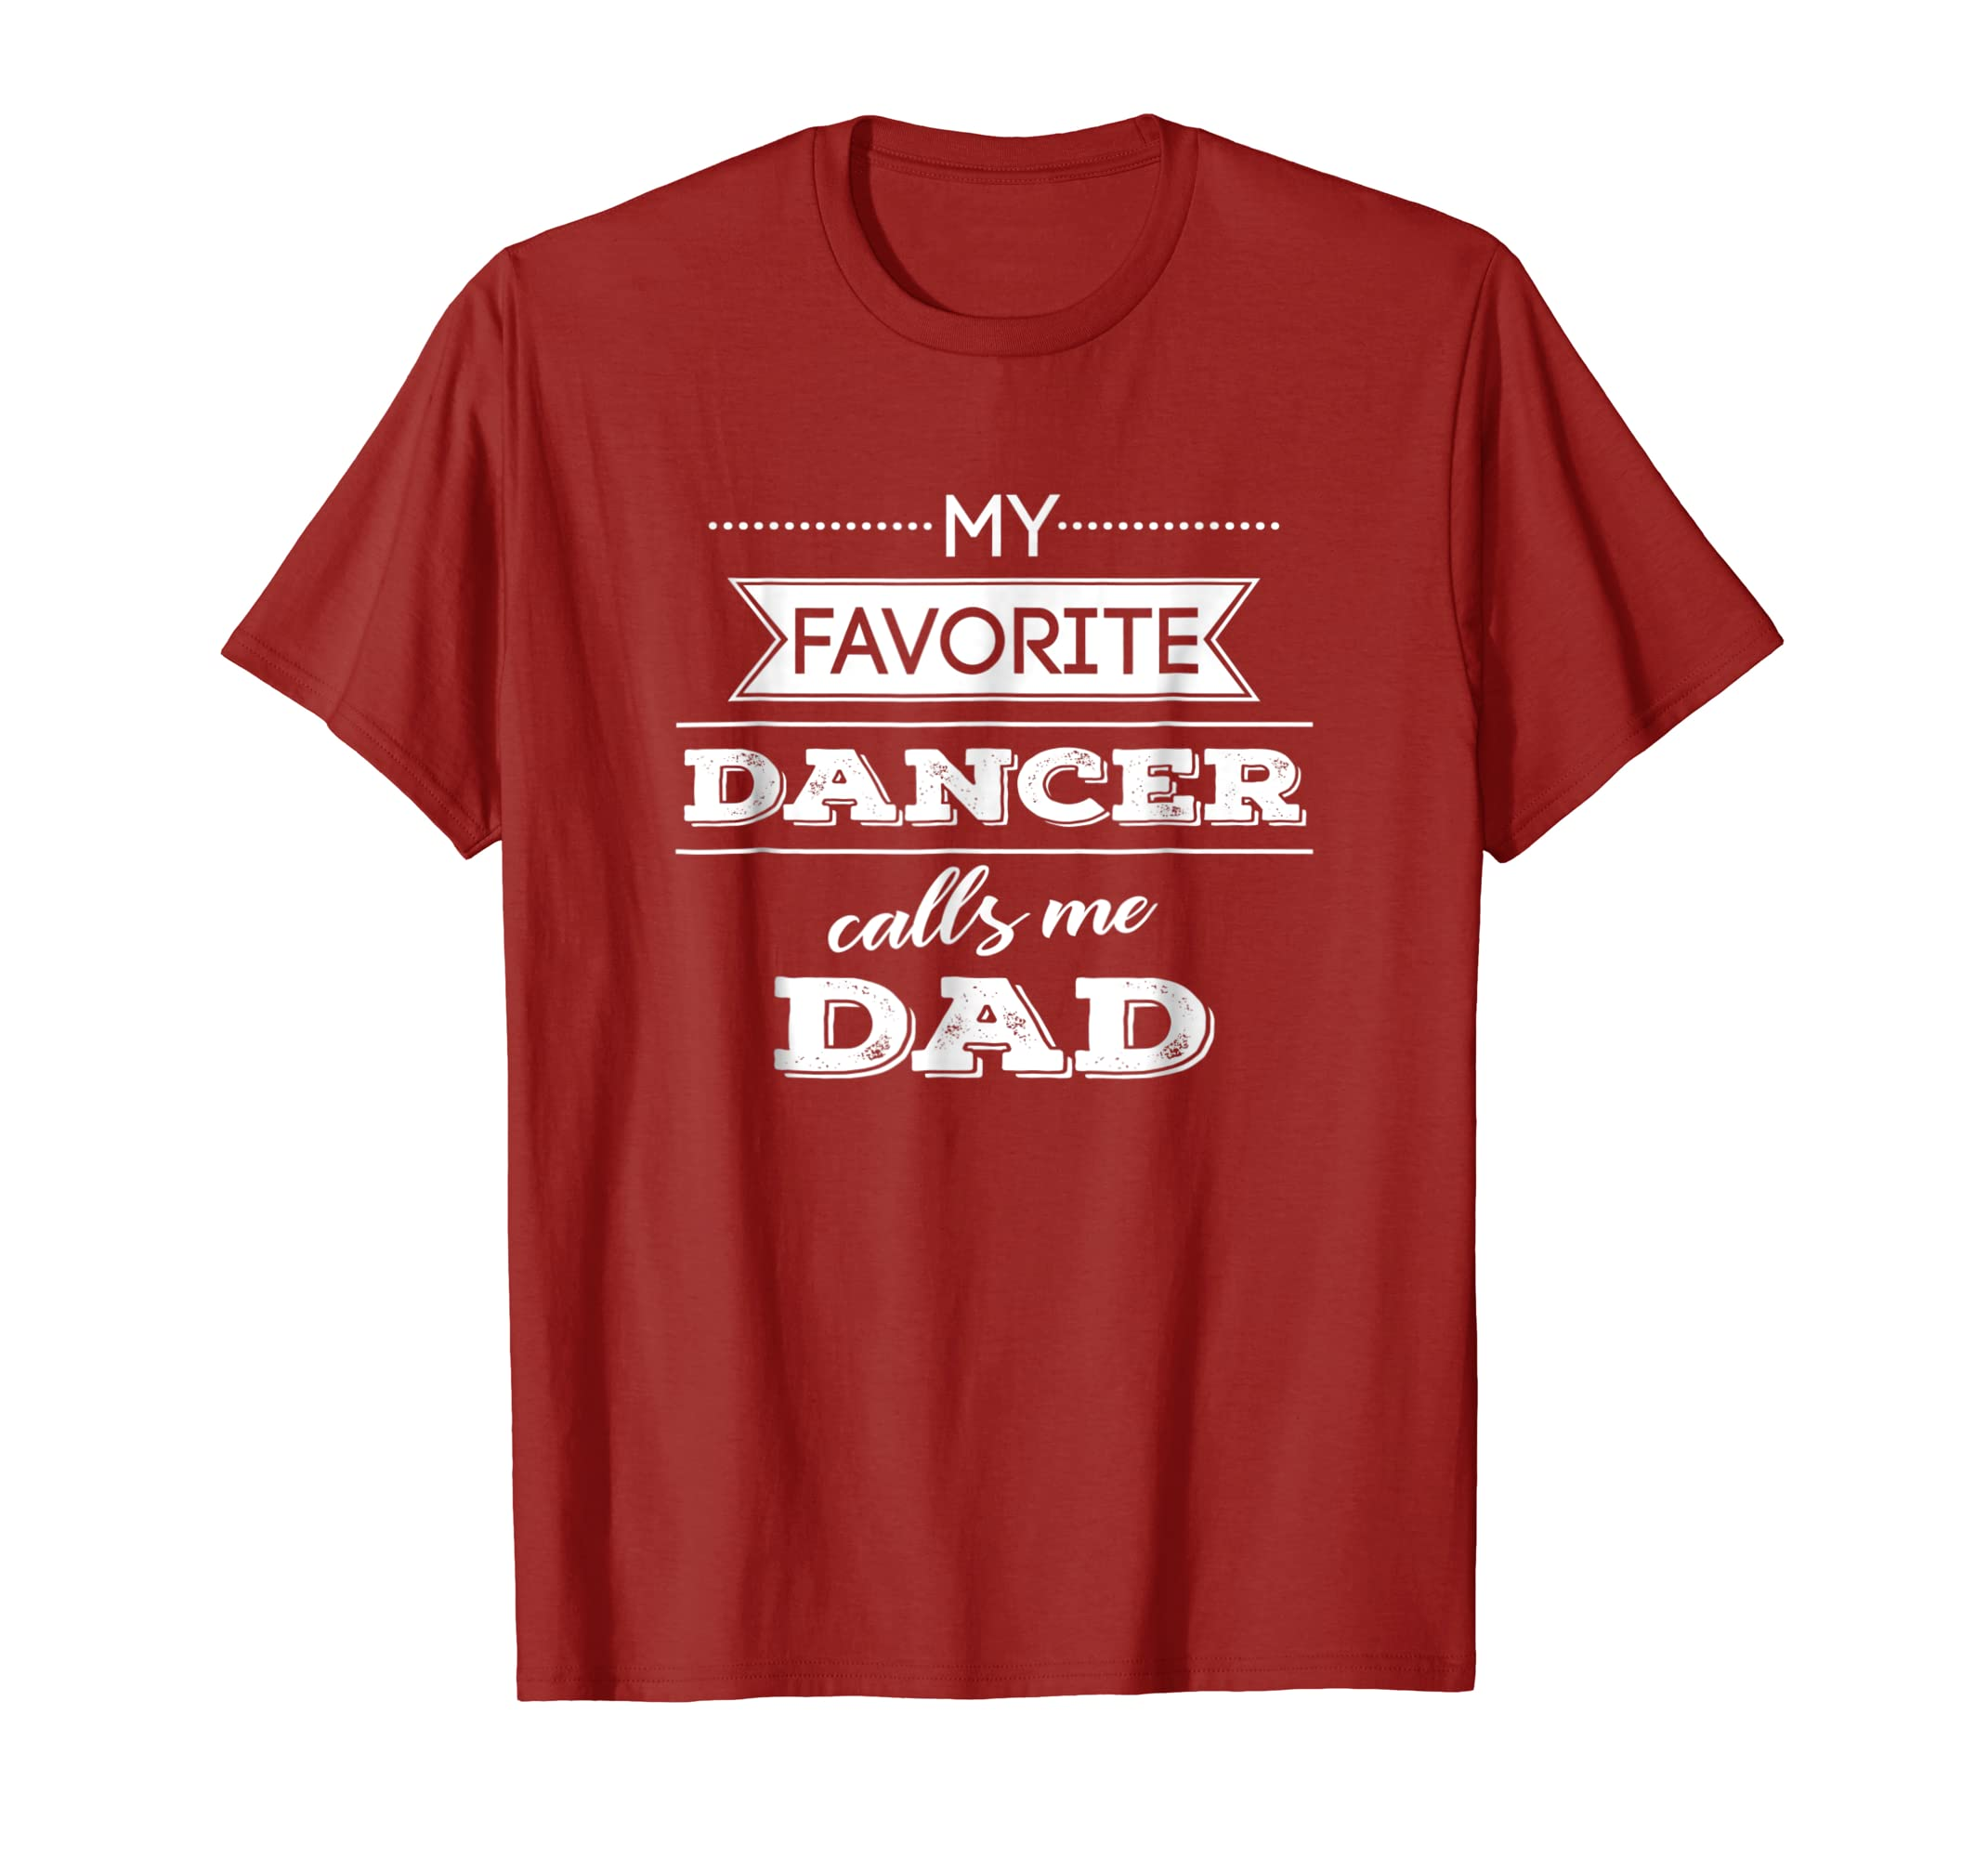 570f371b02 Amazon.com: My Favorite Dancer Calls Me Dad Dance T Shirt, Men Father:  Clothing